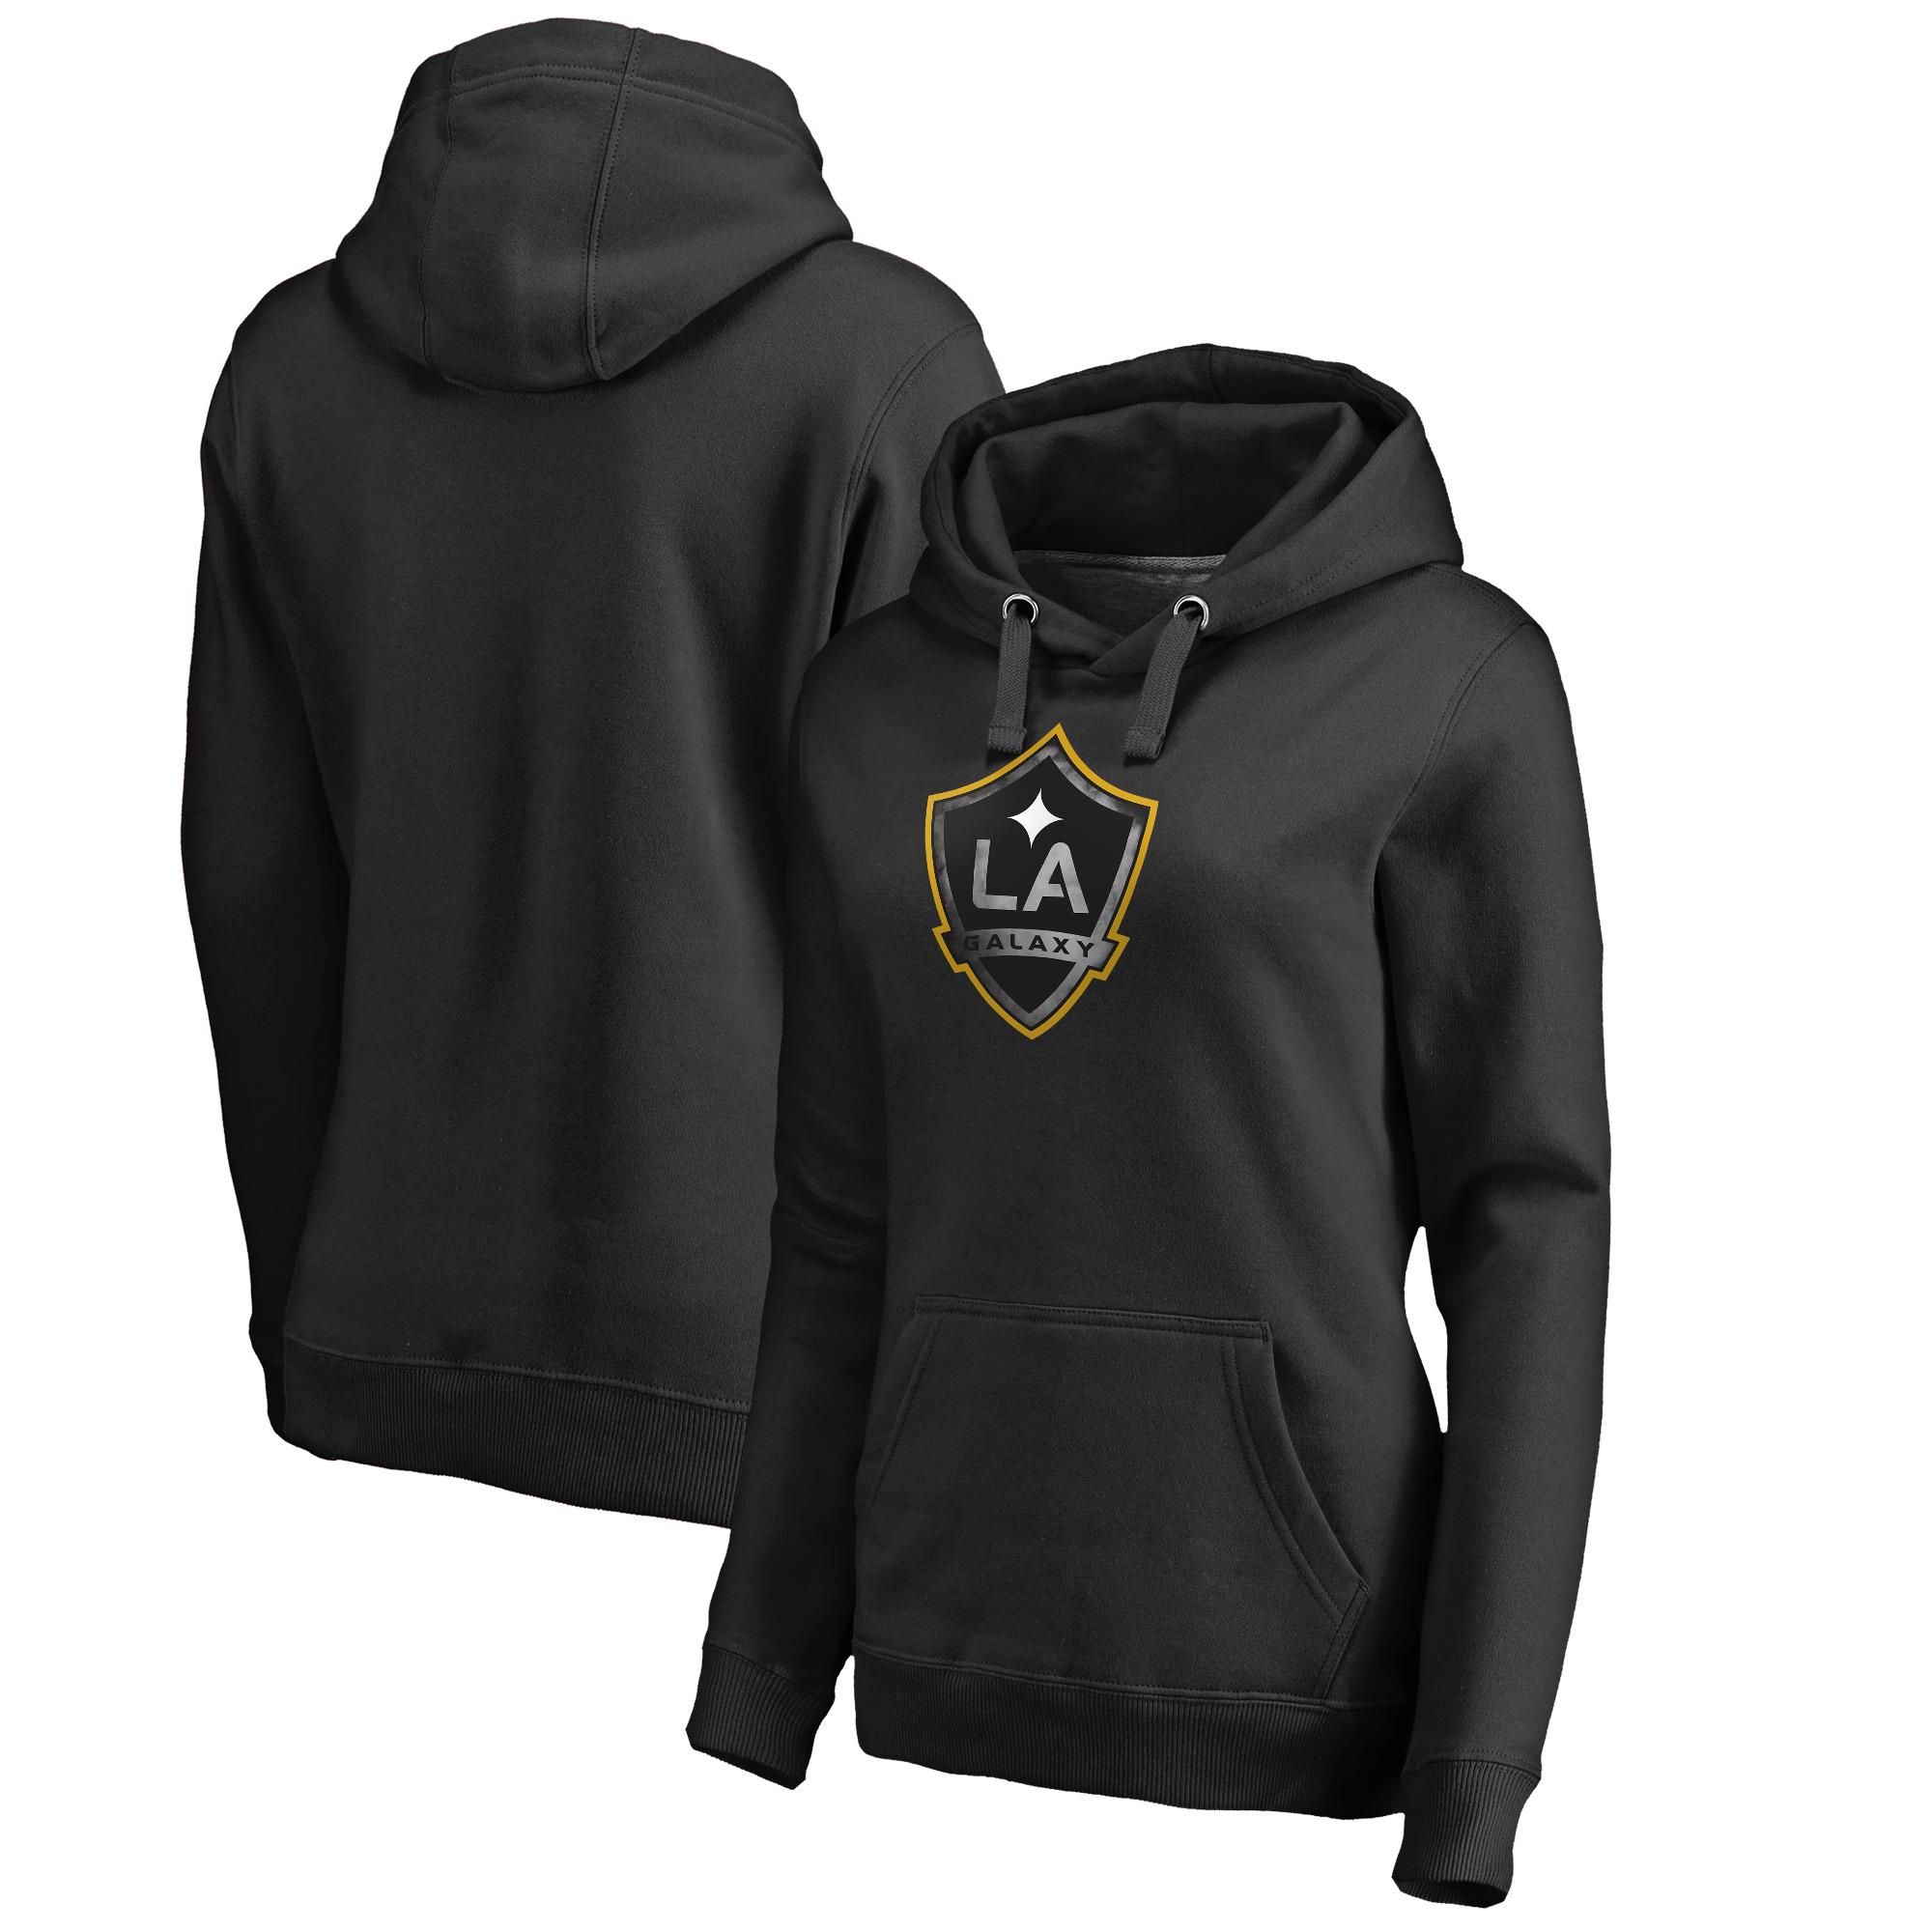 LA Galaxy Fanatics Branded Women's Core Smoke Pullover Hoodie - Black